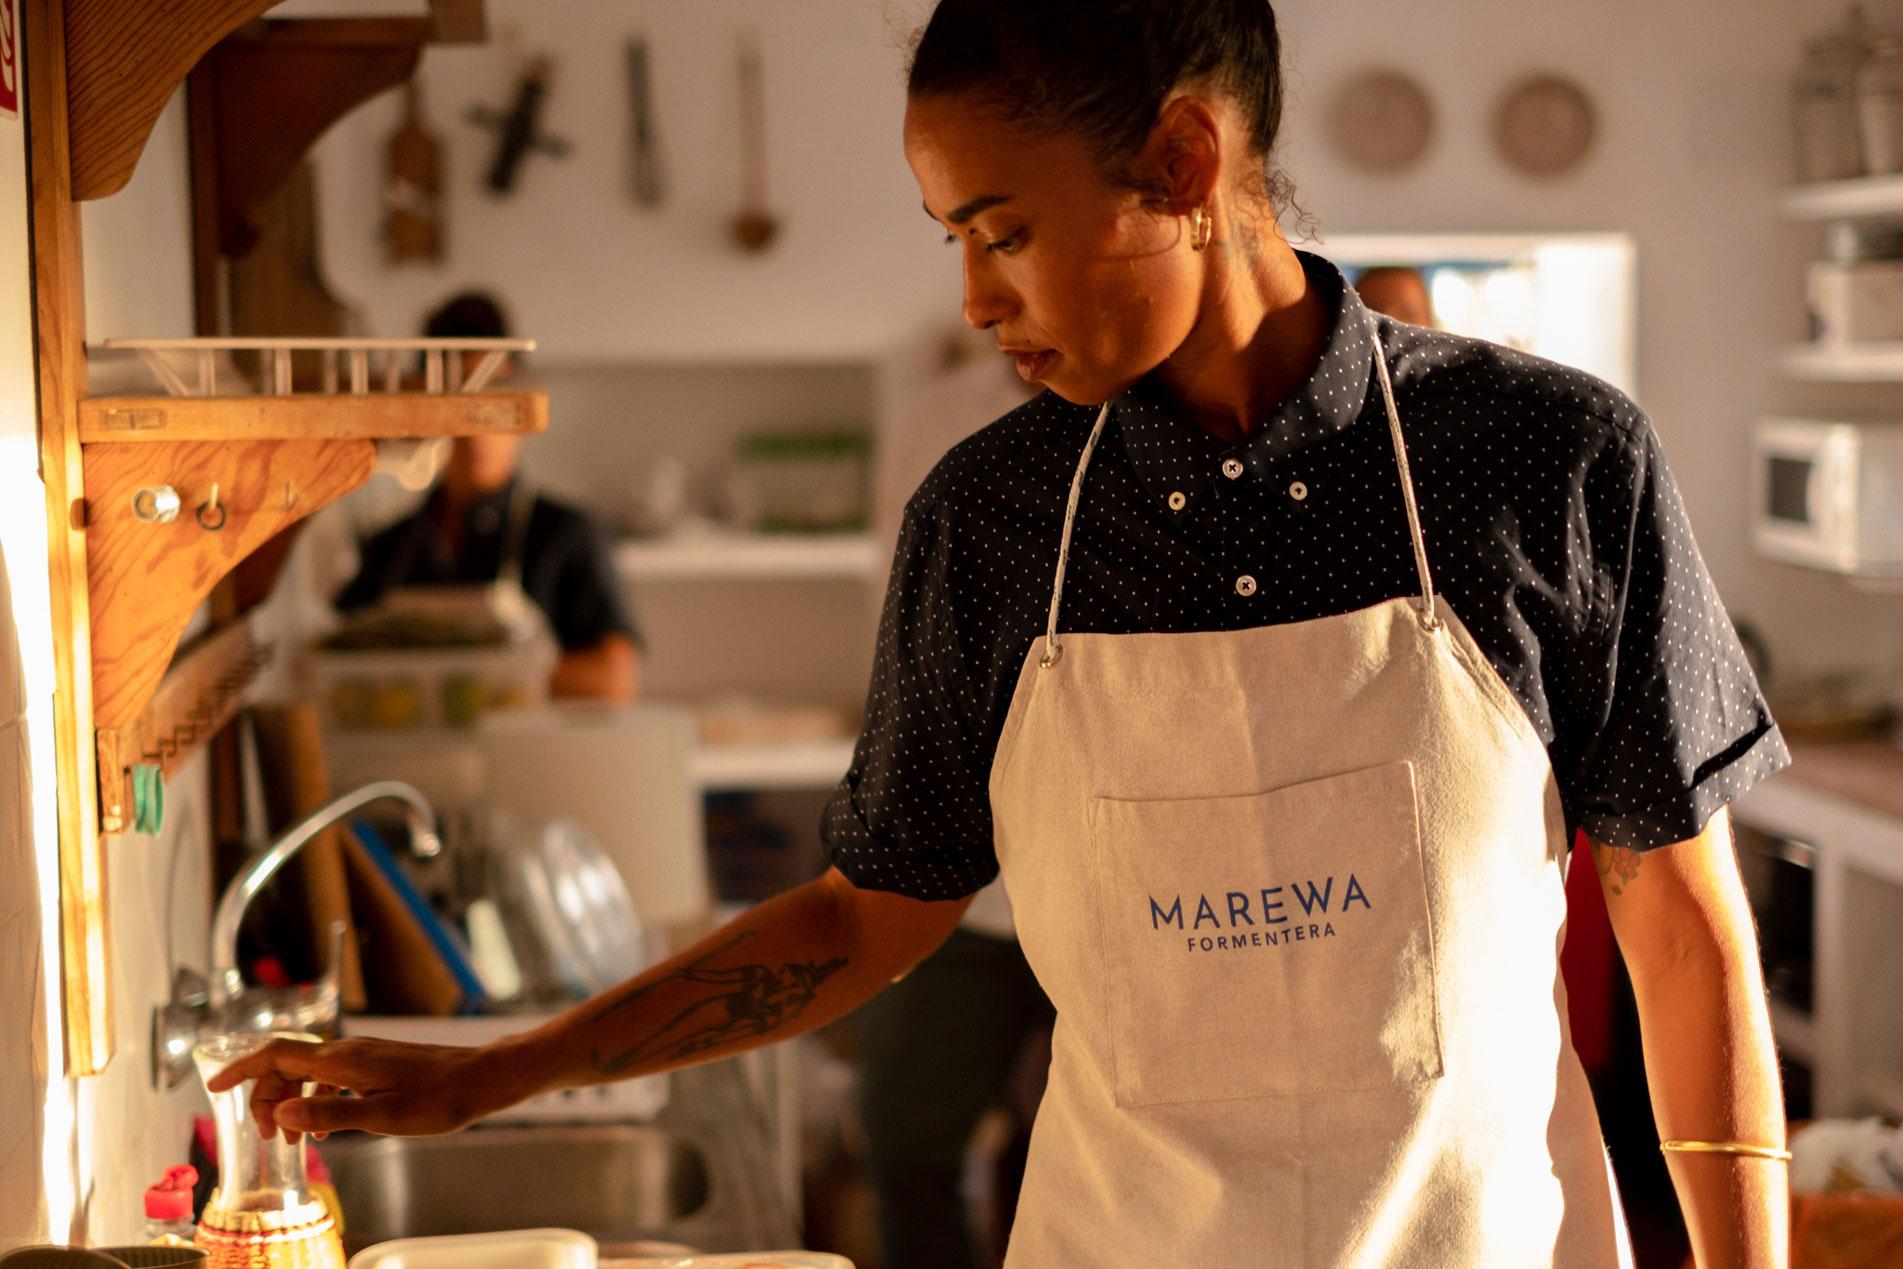 chef-privado-marewa-servicio.jpg